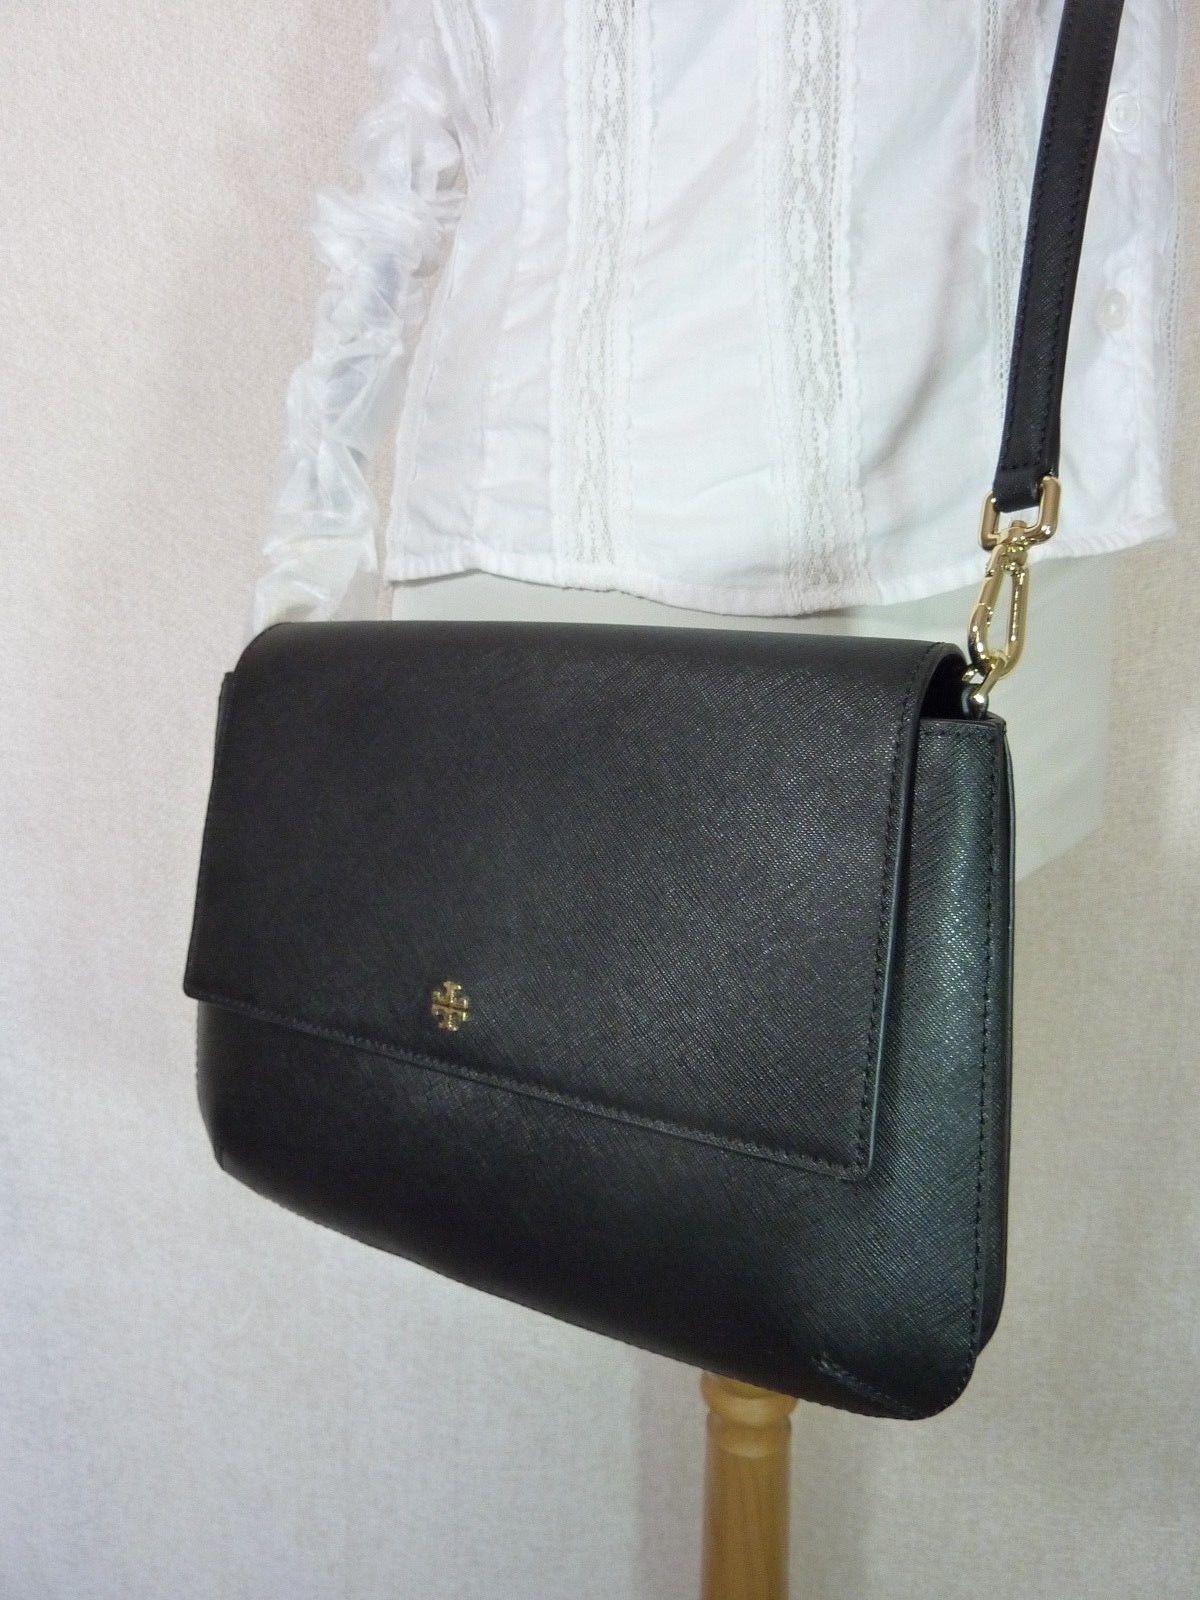 NWT Tory Burch Black Robinson Saffiano Combo Messenger Cross Body Bag